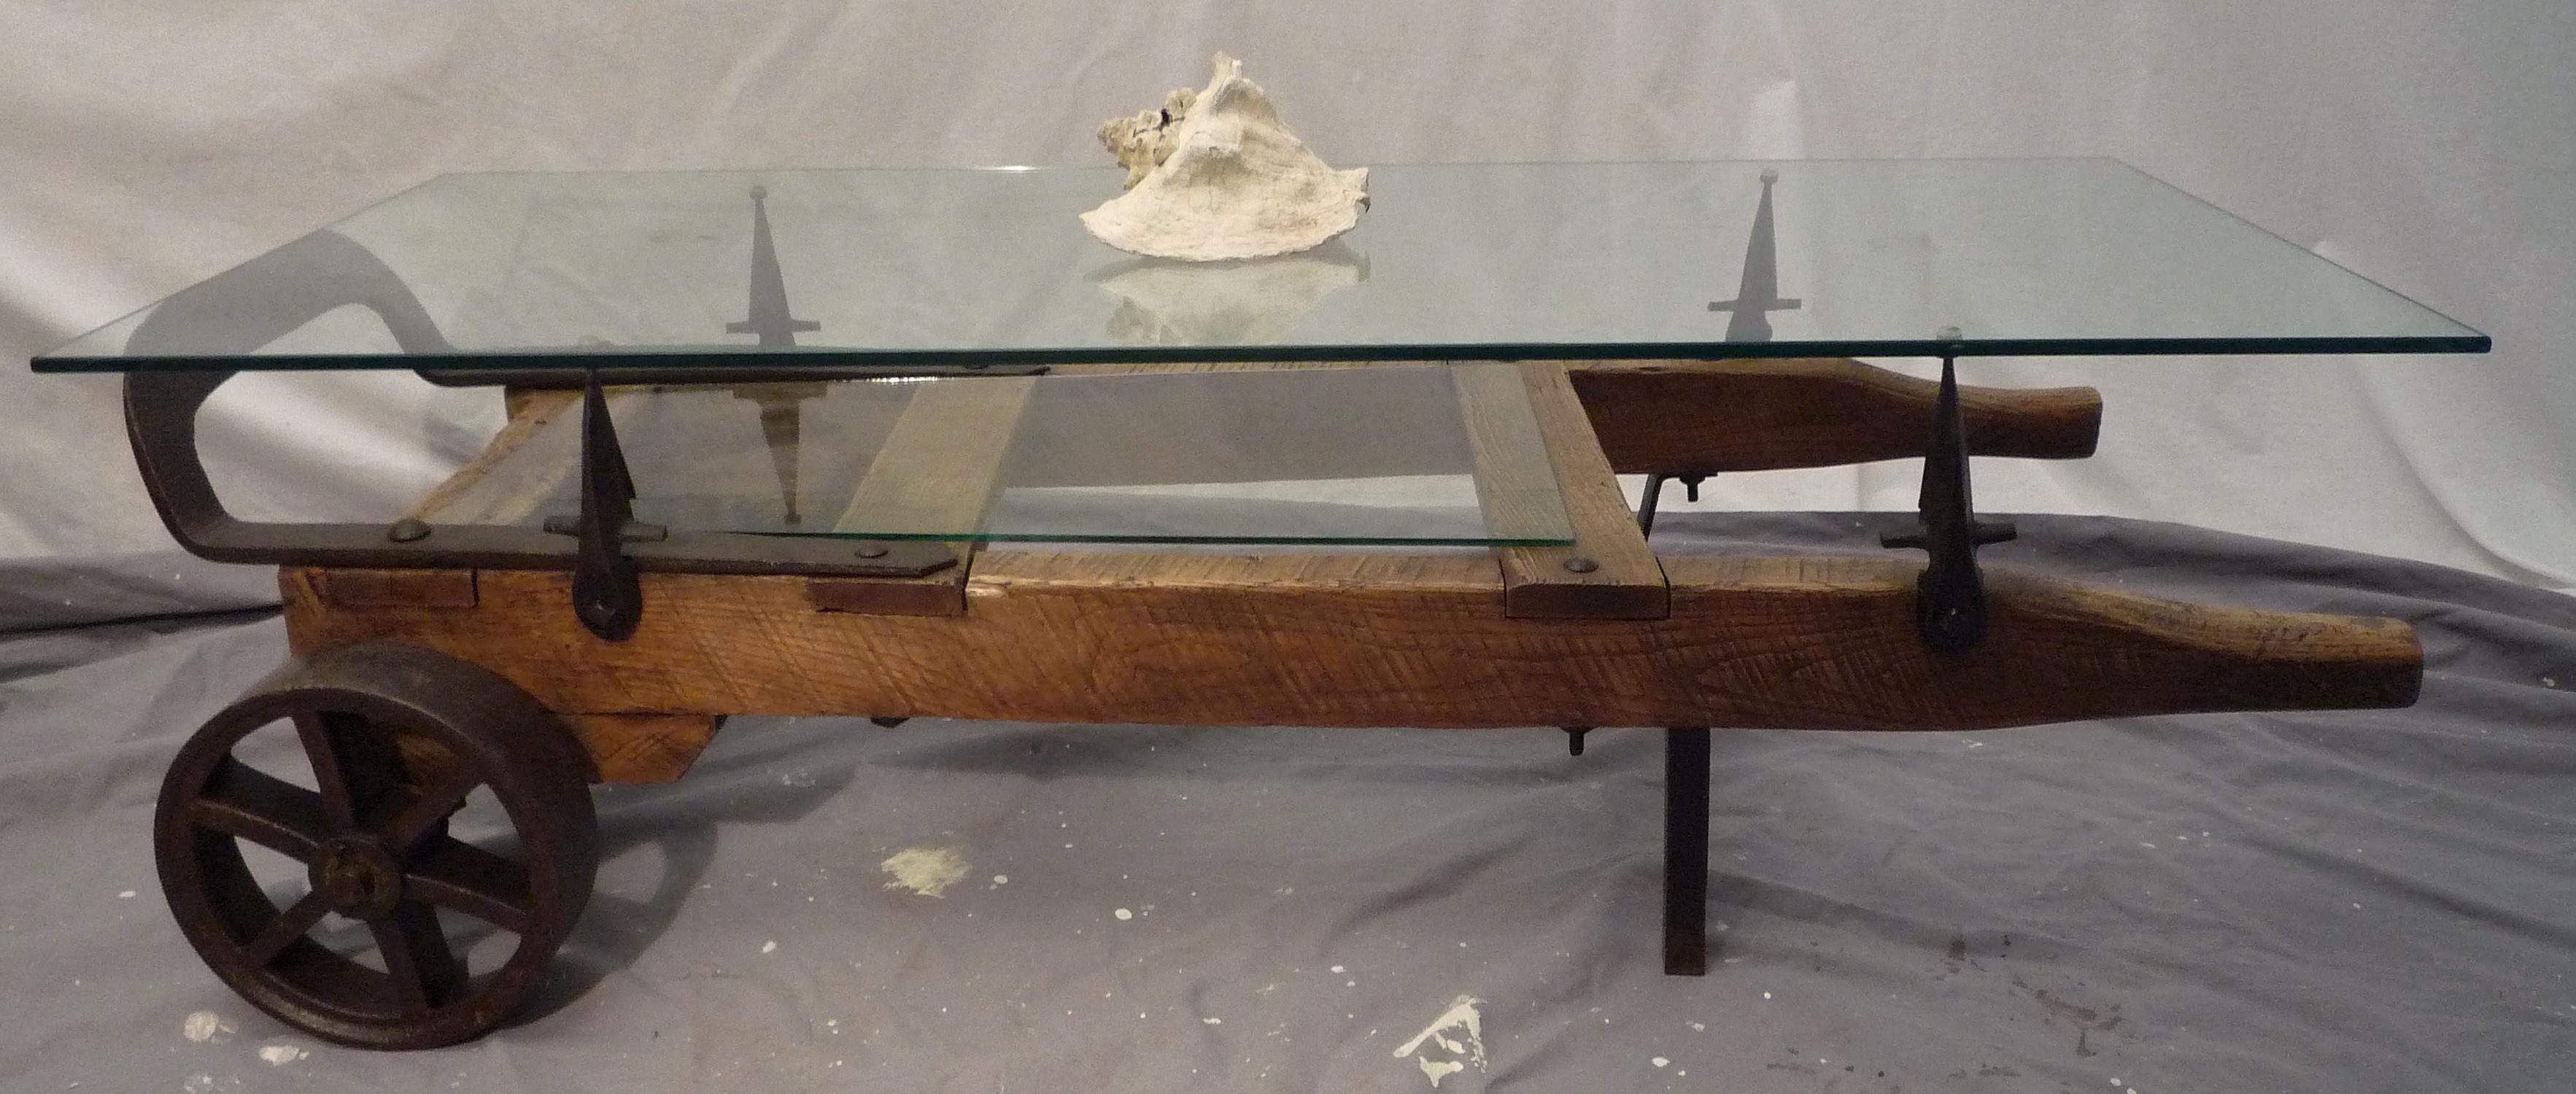 Hand Truck Coffee Table Modern Rustic